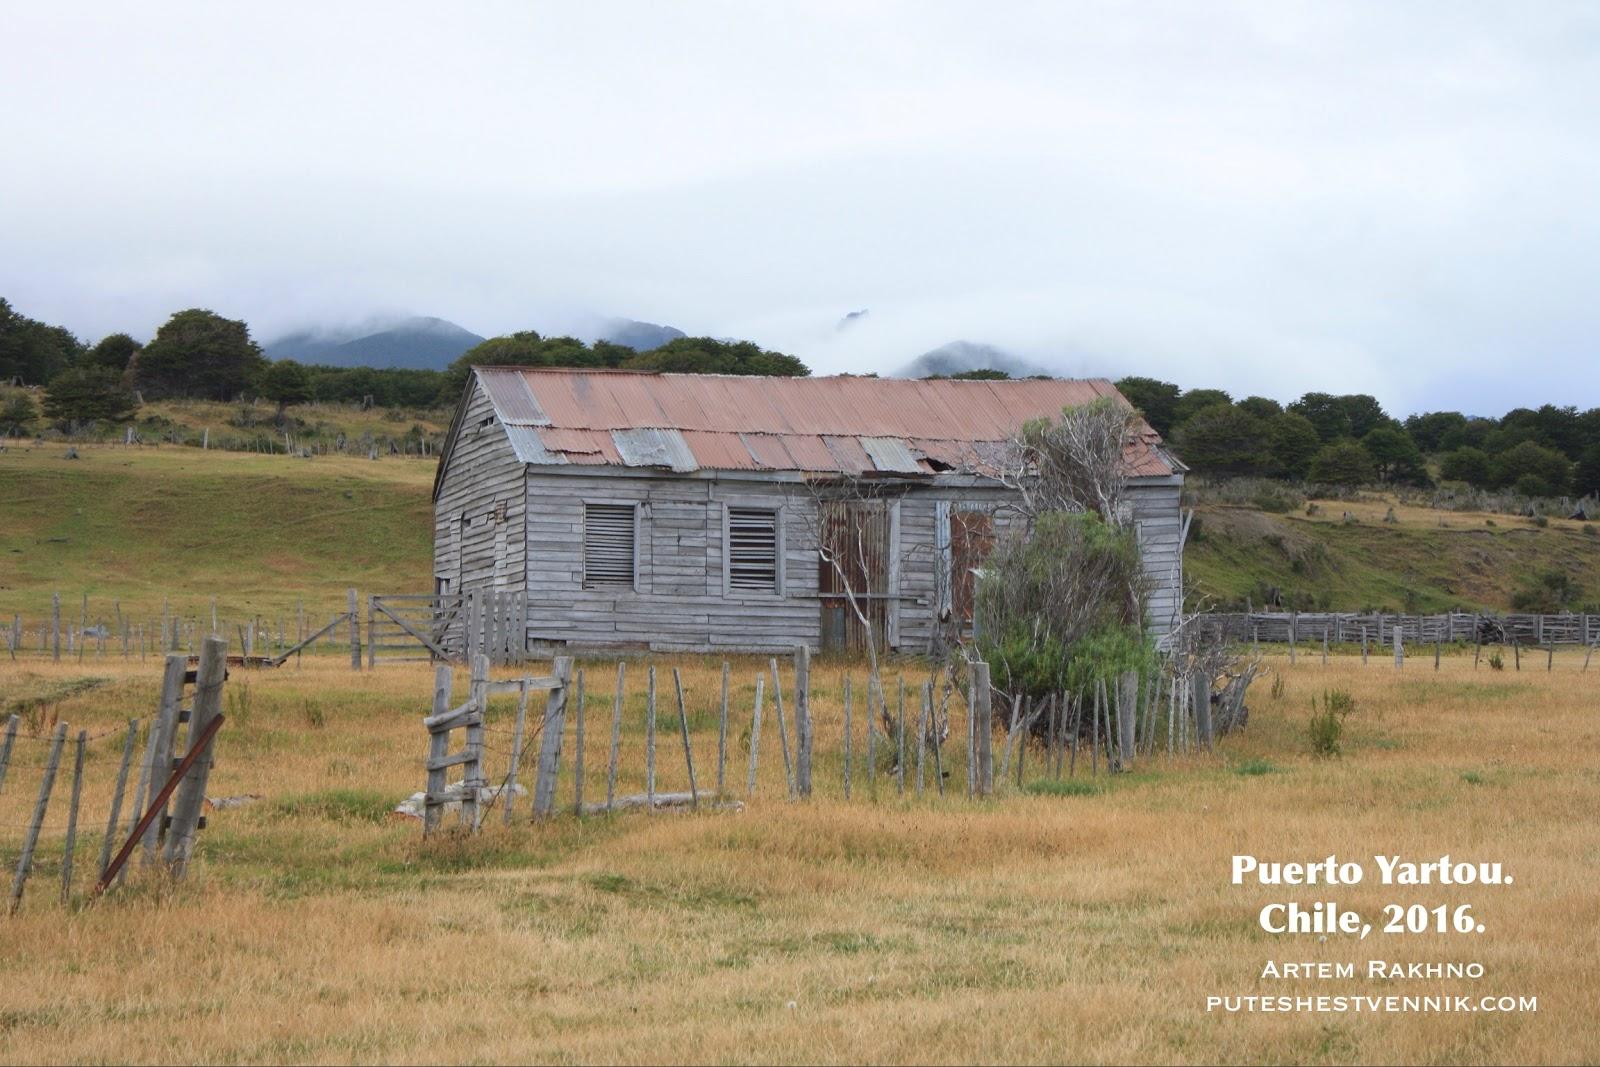 Эстанция Пуэрто Яртоу в Чили